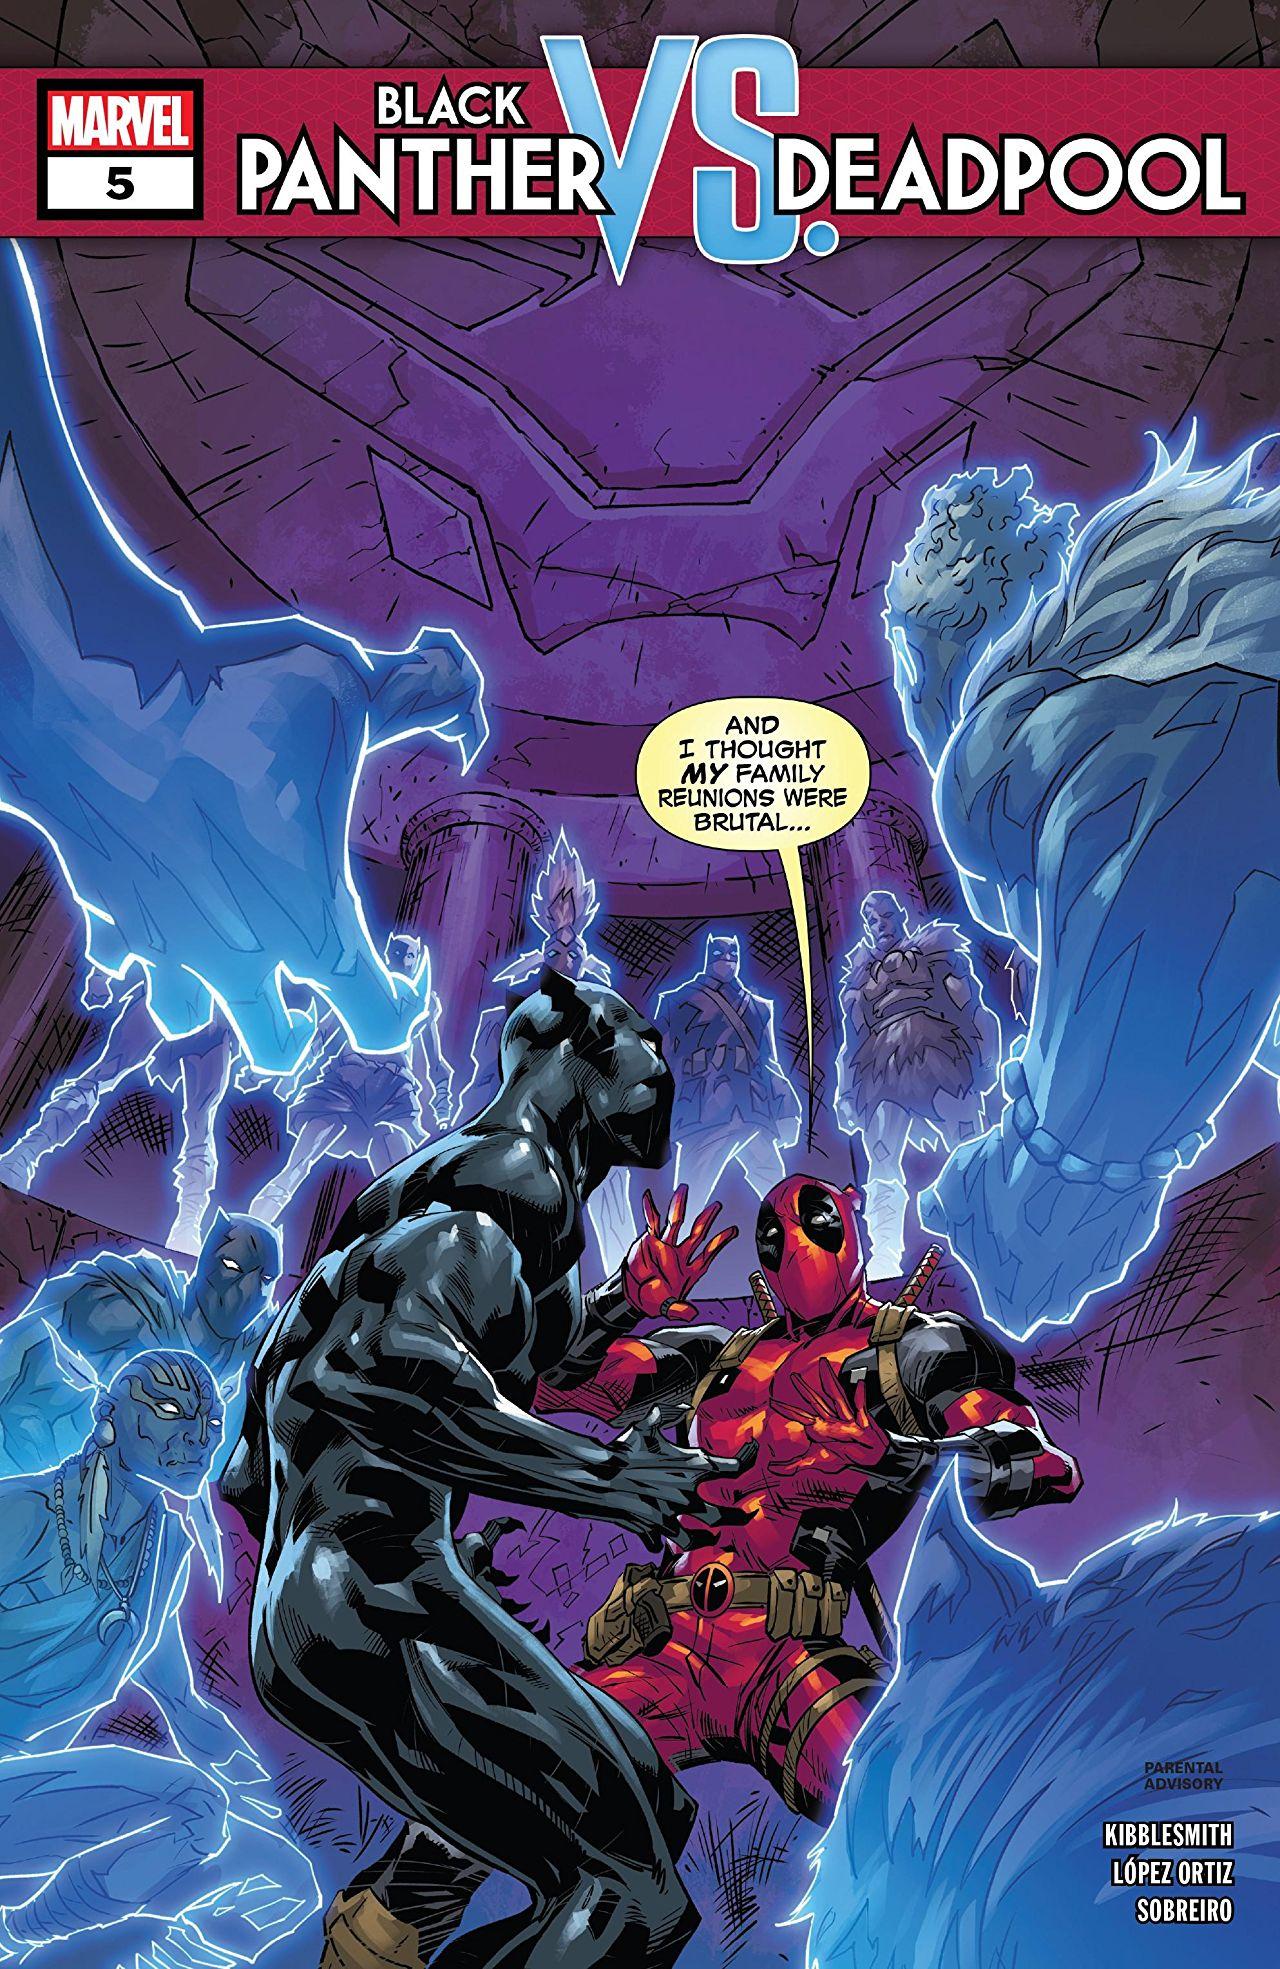 Black Panther vs. Deadpool Vol 1 5